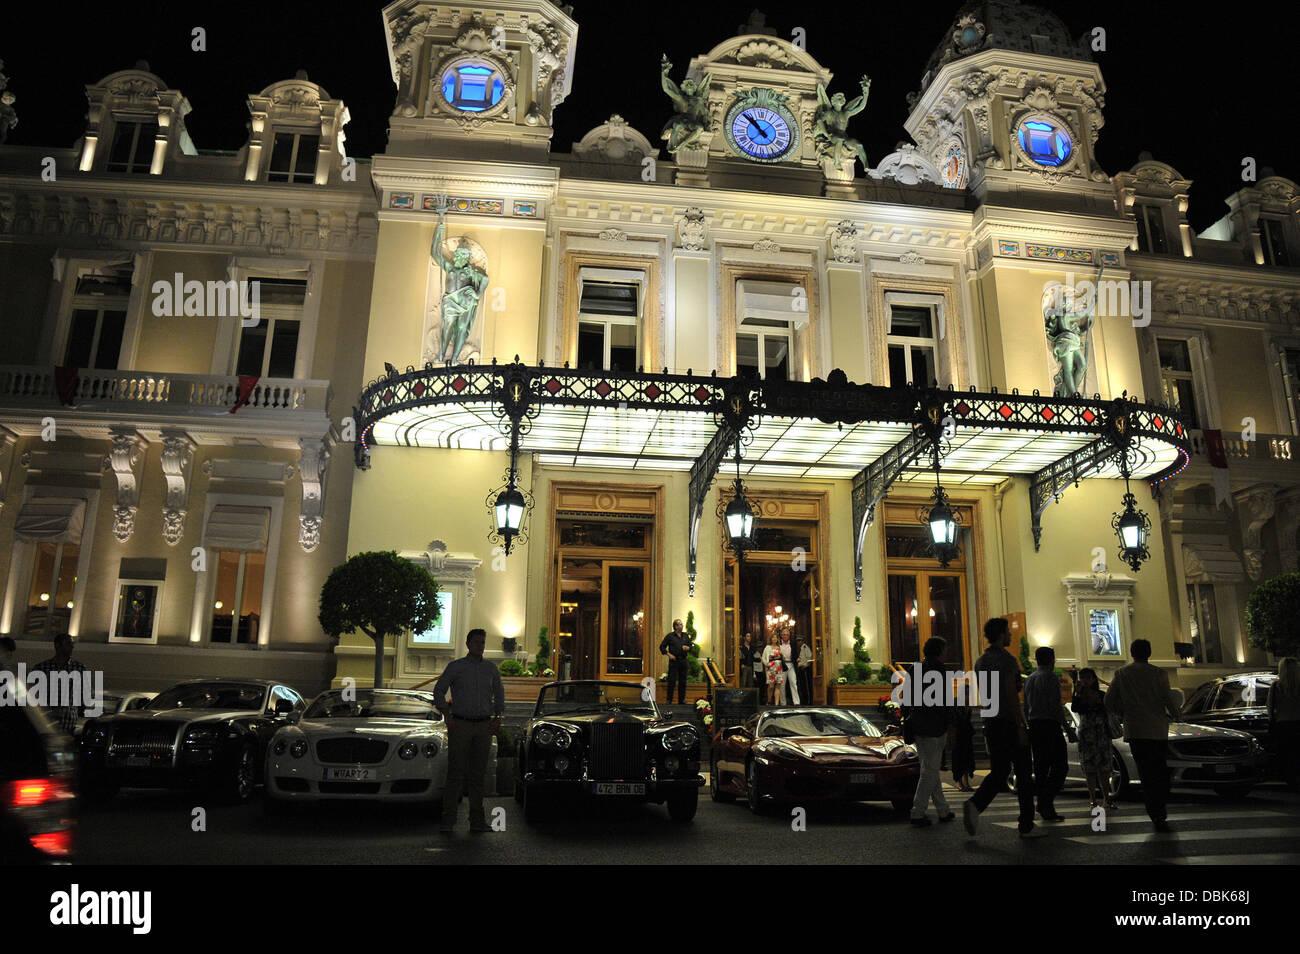 las vegas online casino for fun